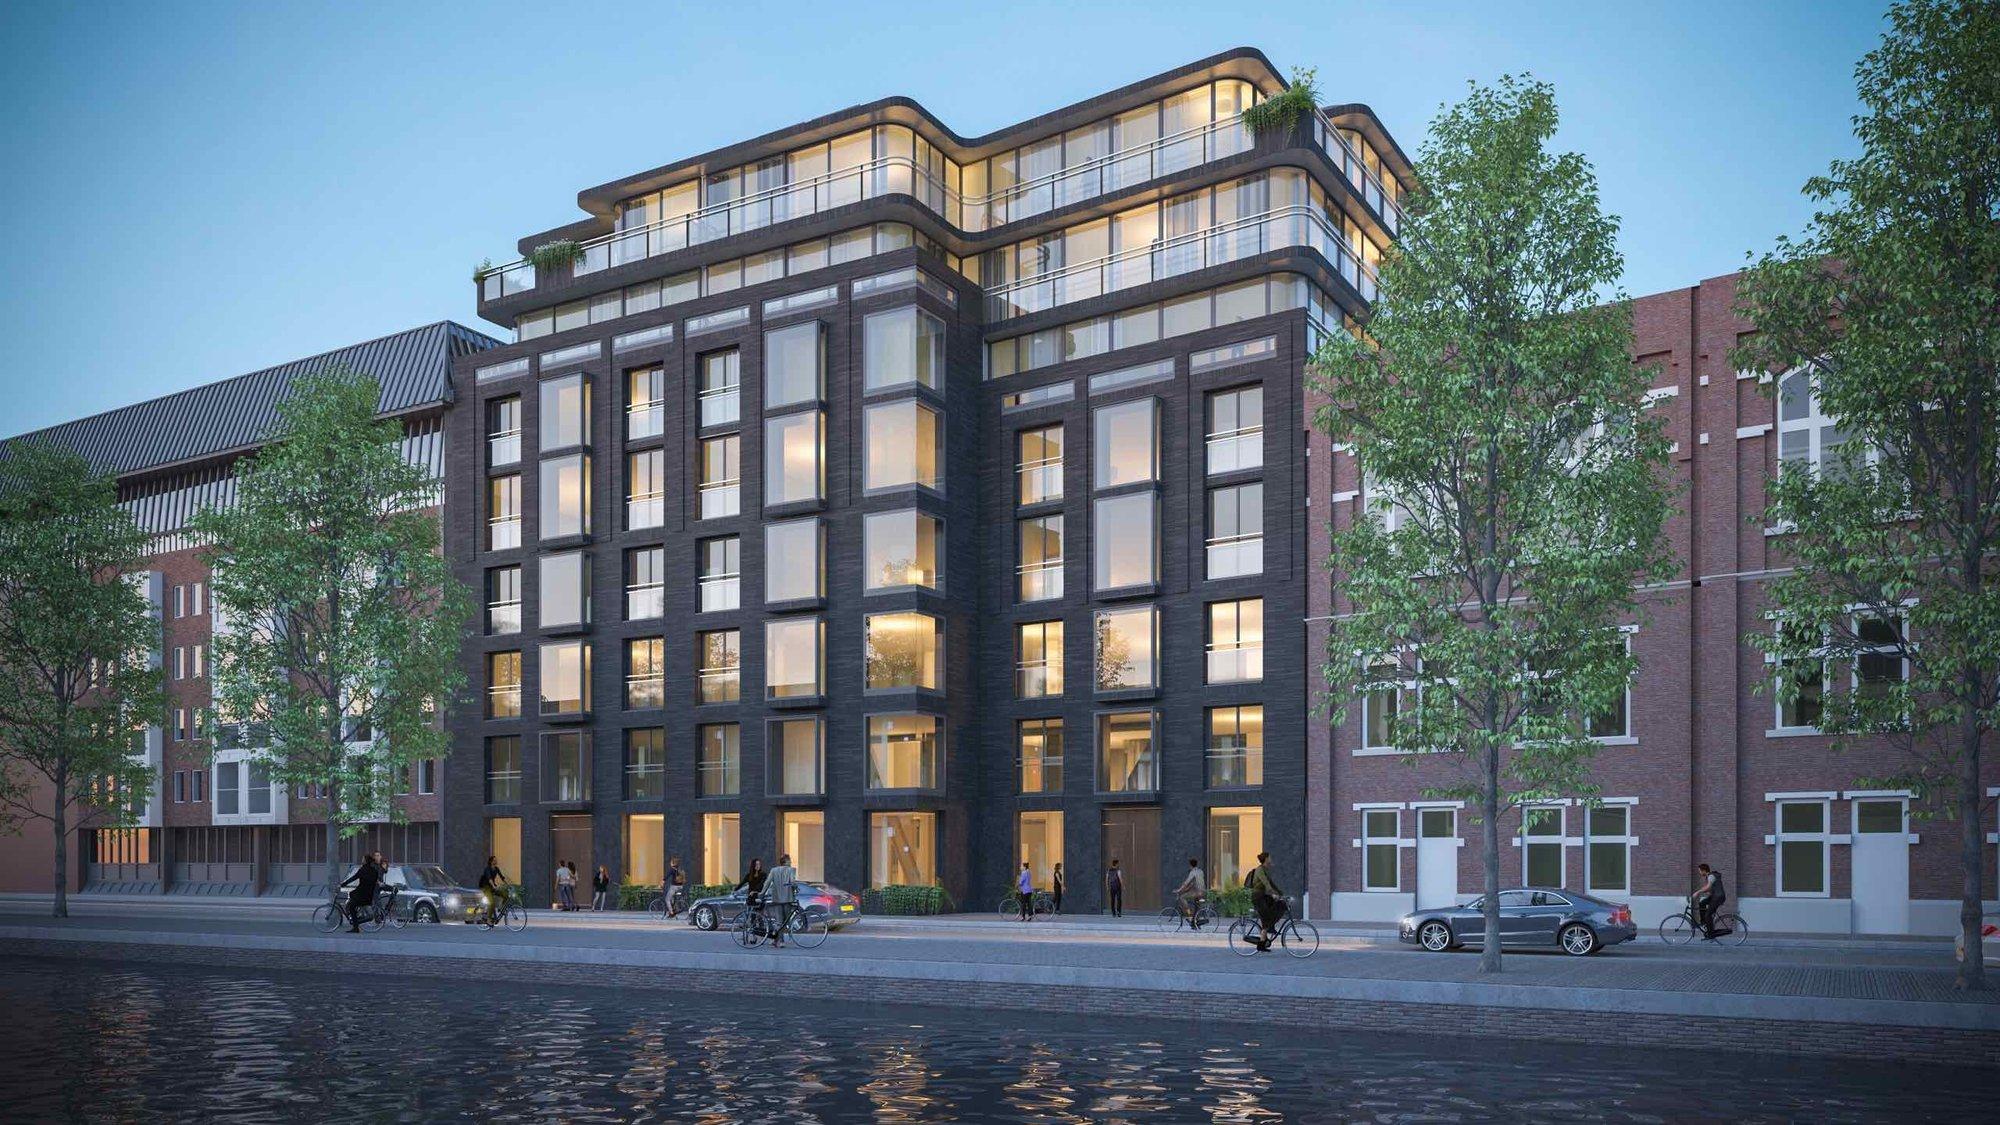 Apartment in Apollobuurt, North Holland, Netherlands 1 - 11615760